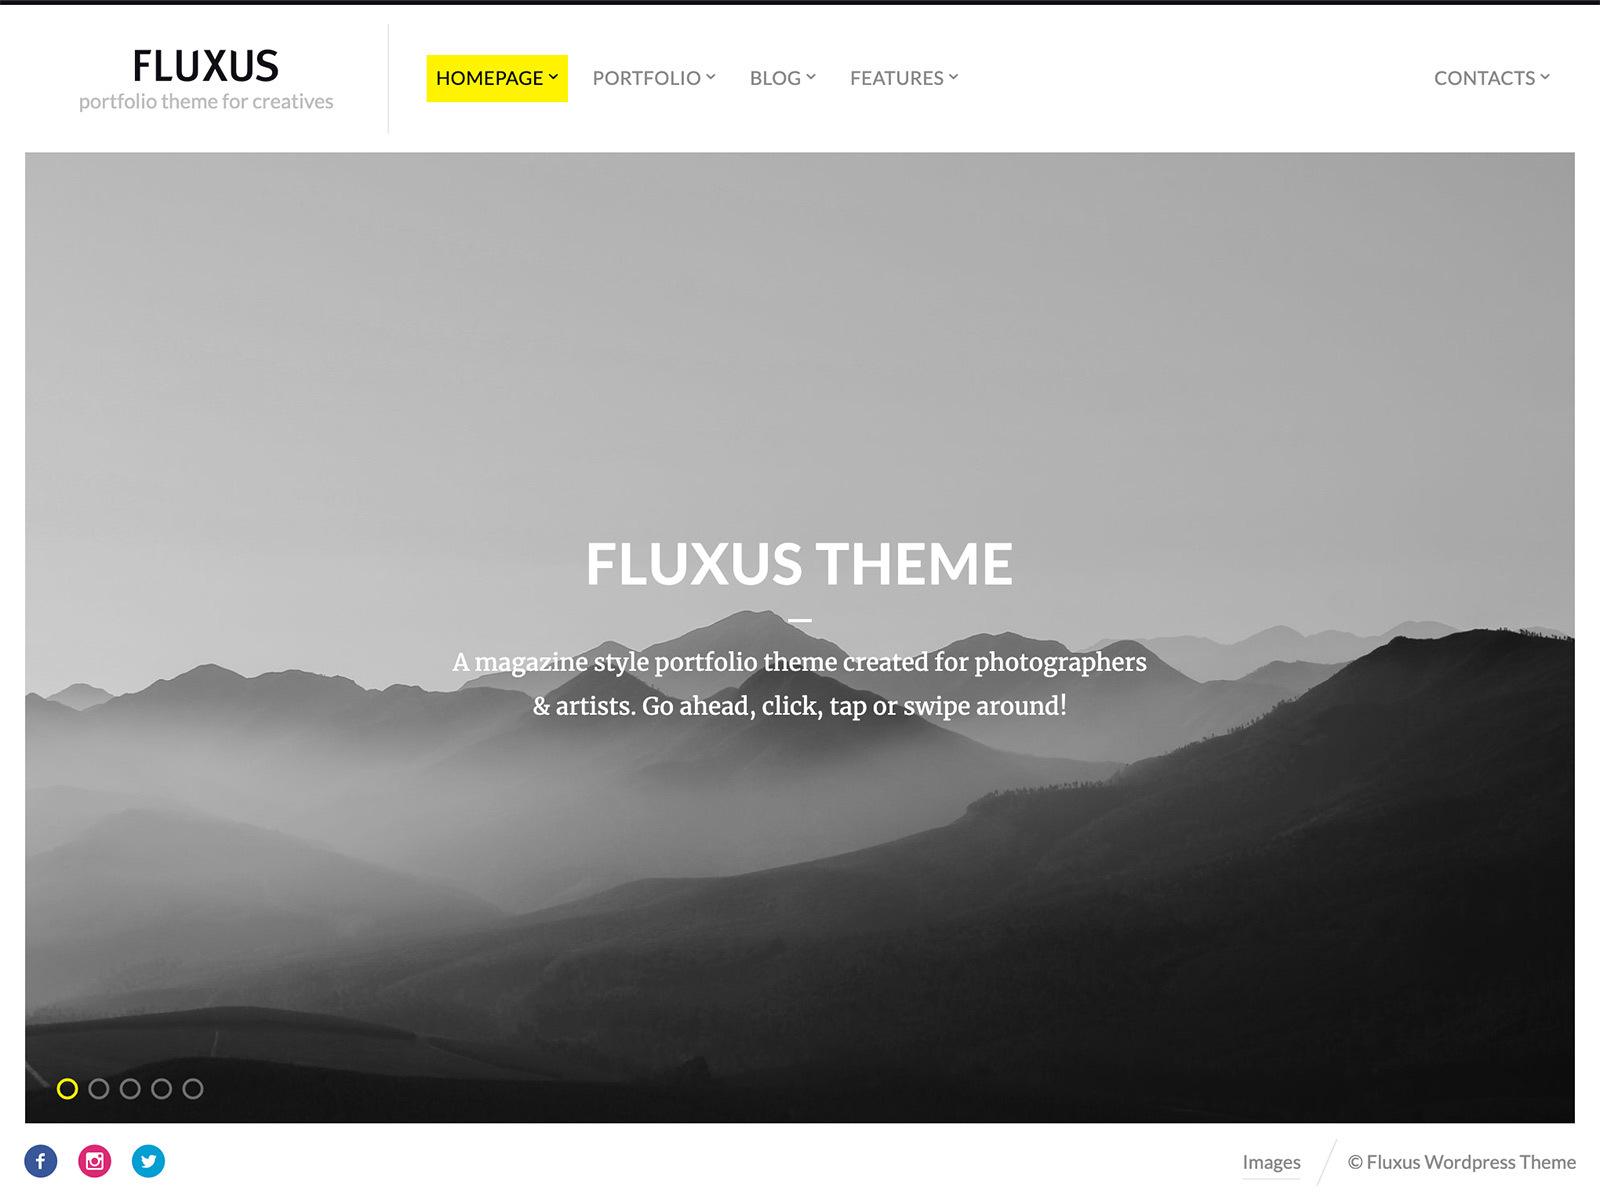 Fluxus WordPress theme image